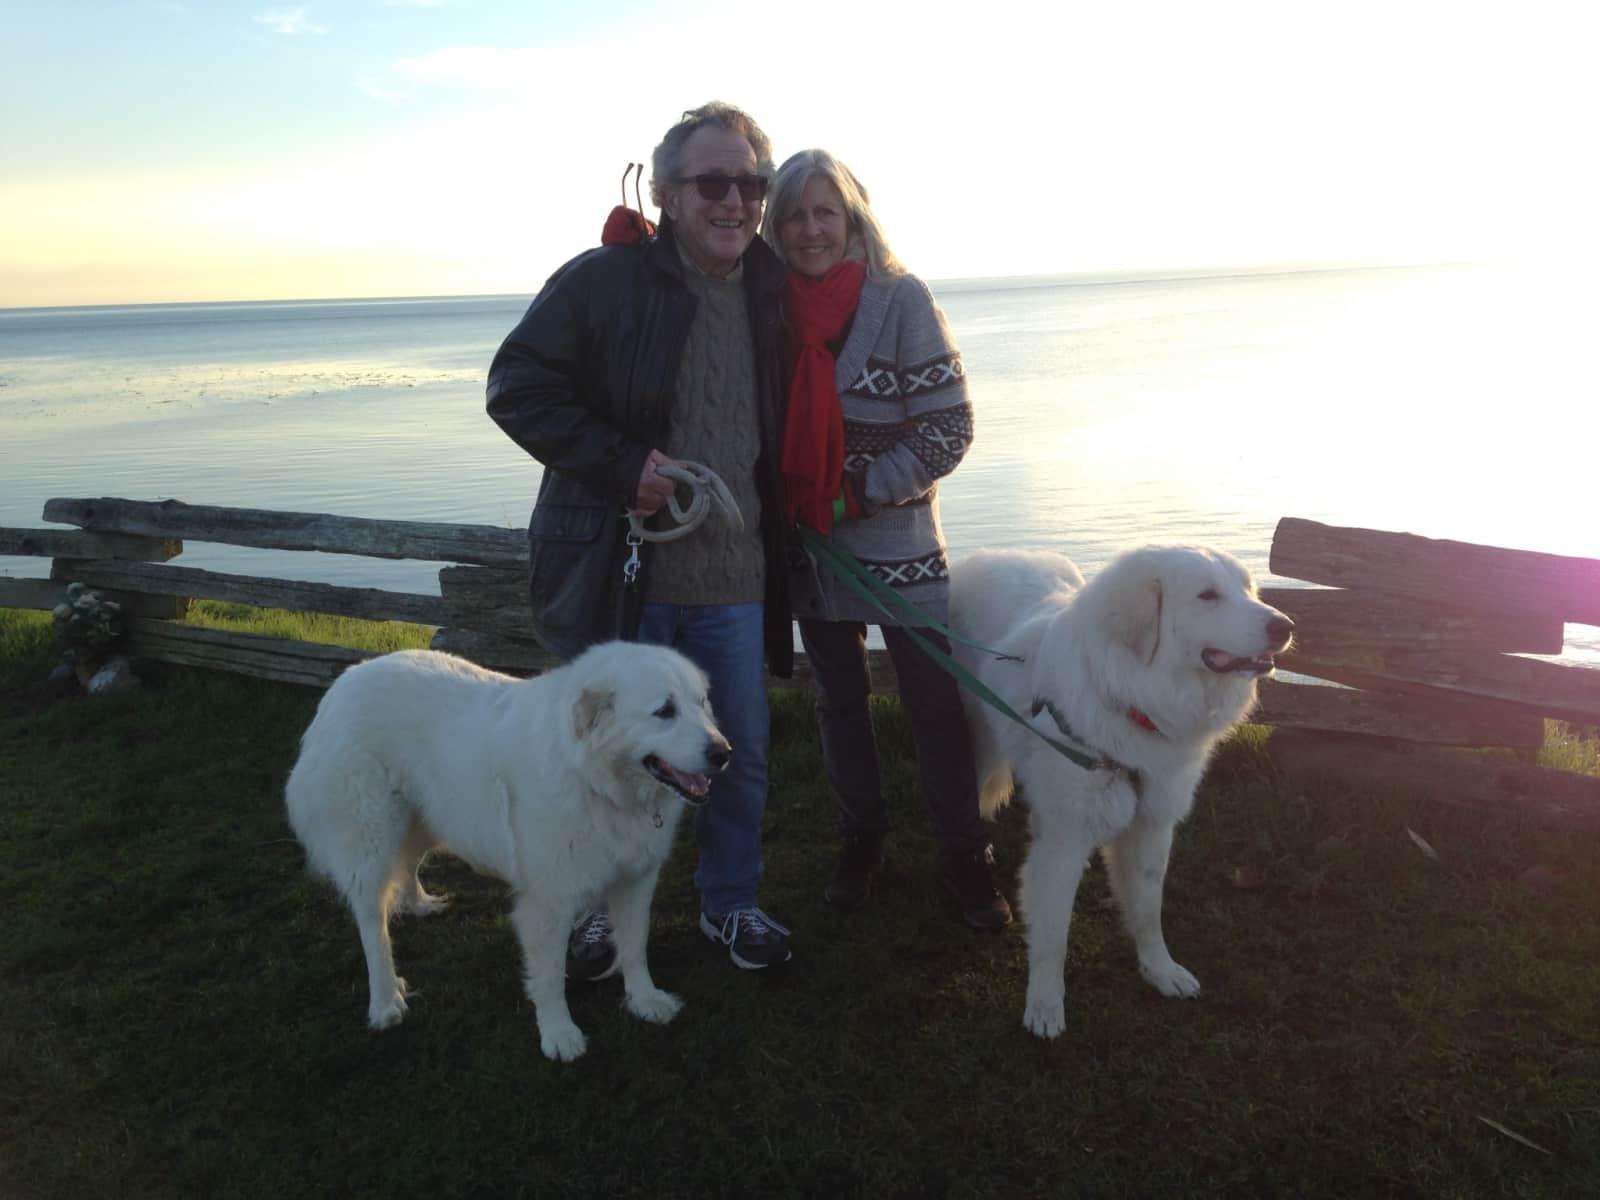 Paul & Valerie from Ladysmith, British Columbia, Canada